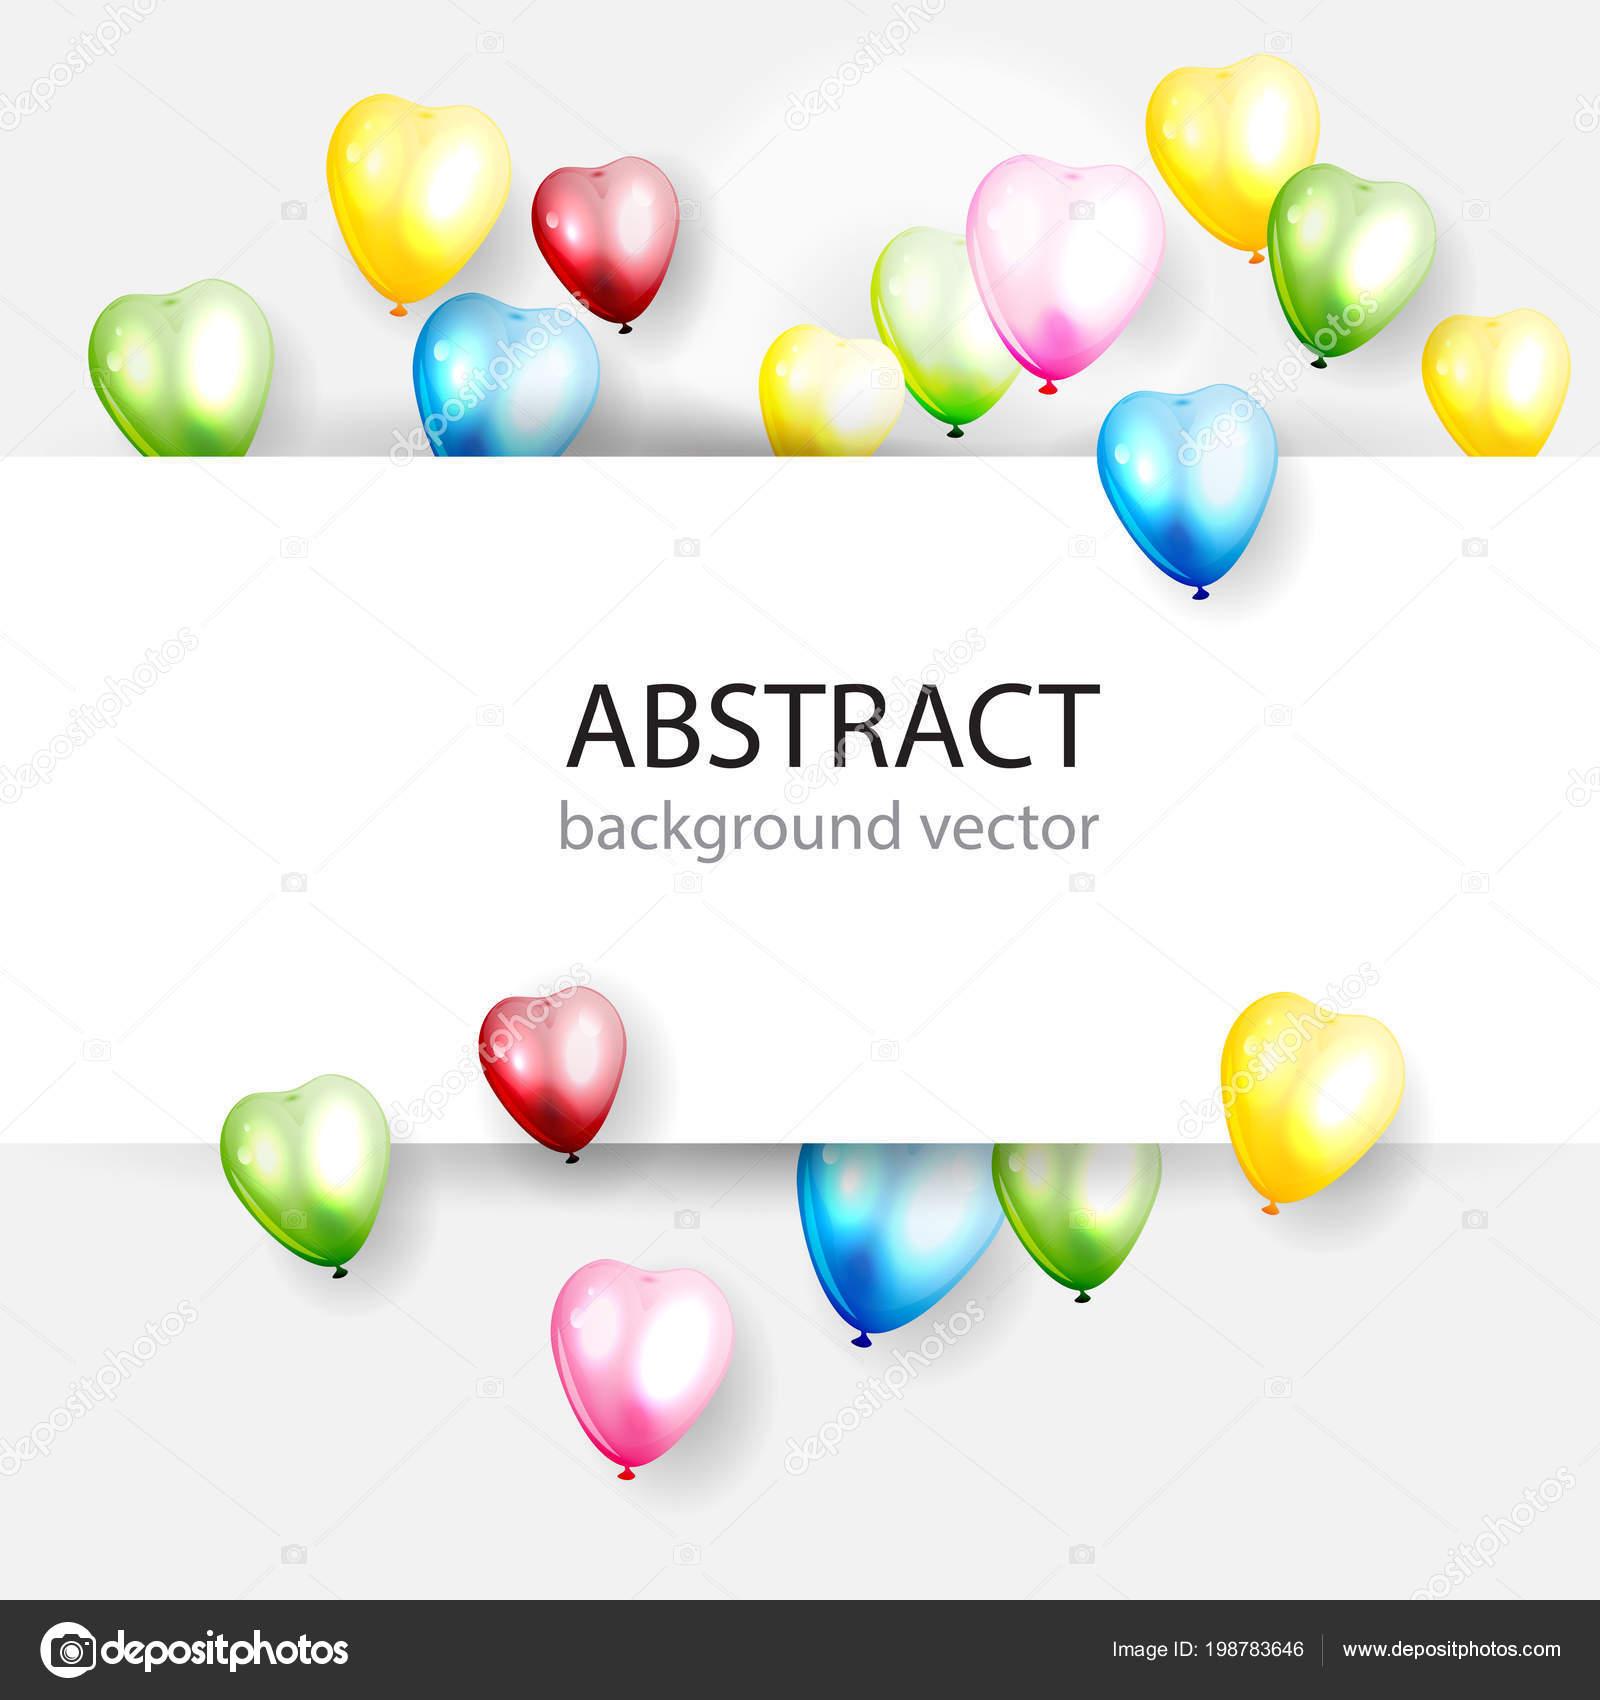 Fondo Colorida Celebración Con Globos Ilustración Vectorial — Vector de  stock b6203bcf9f8